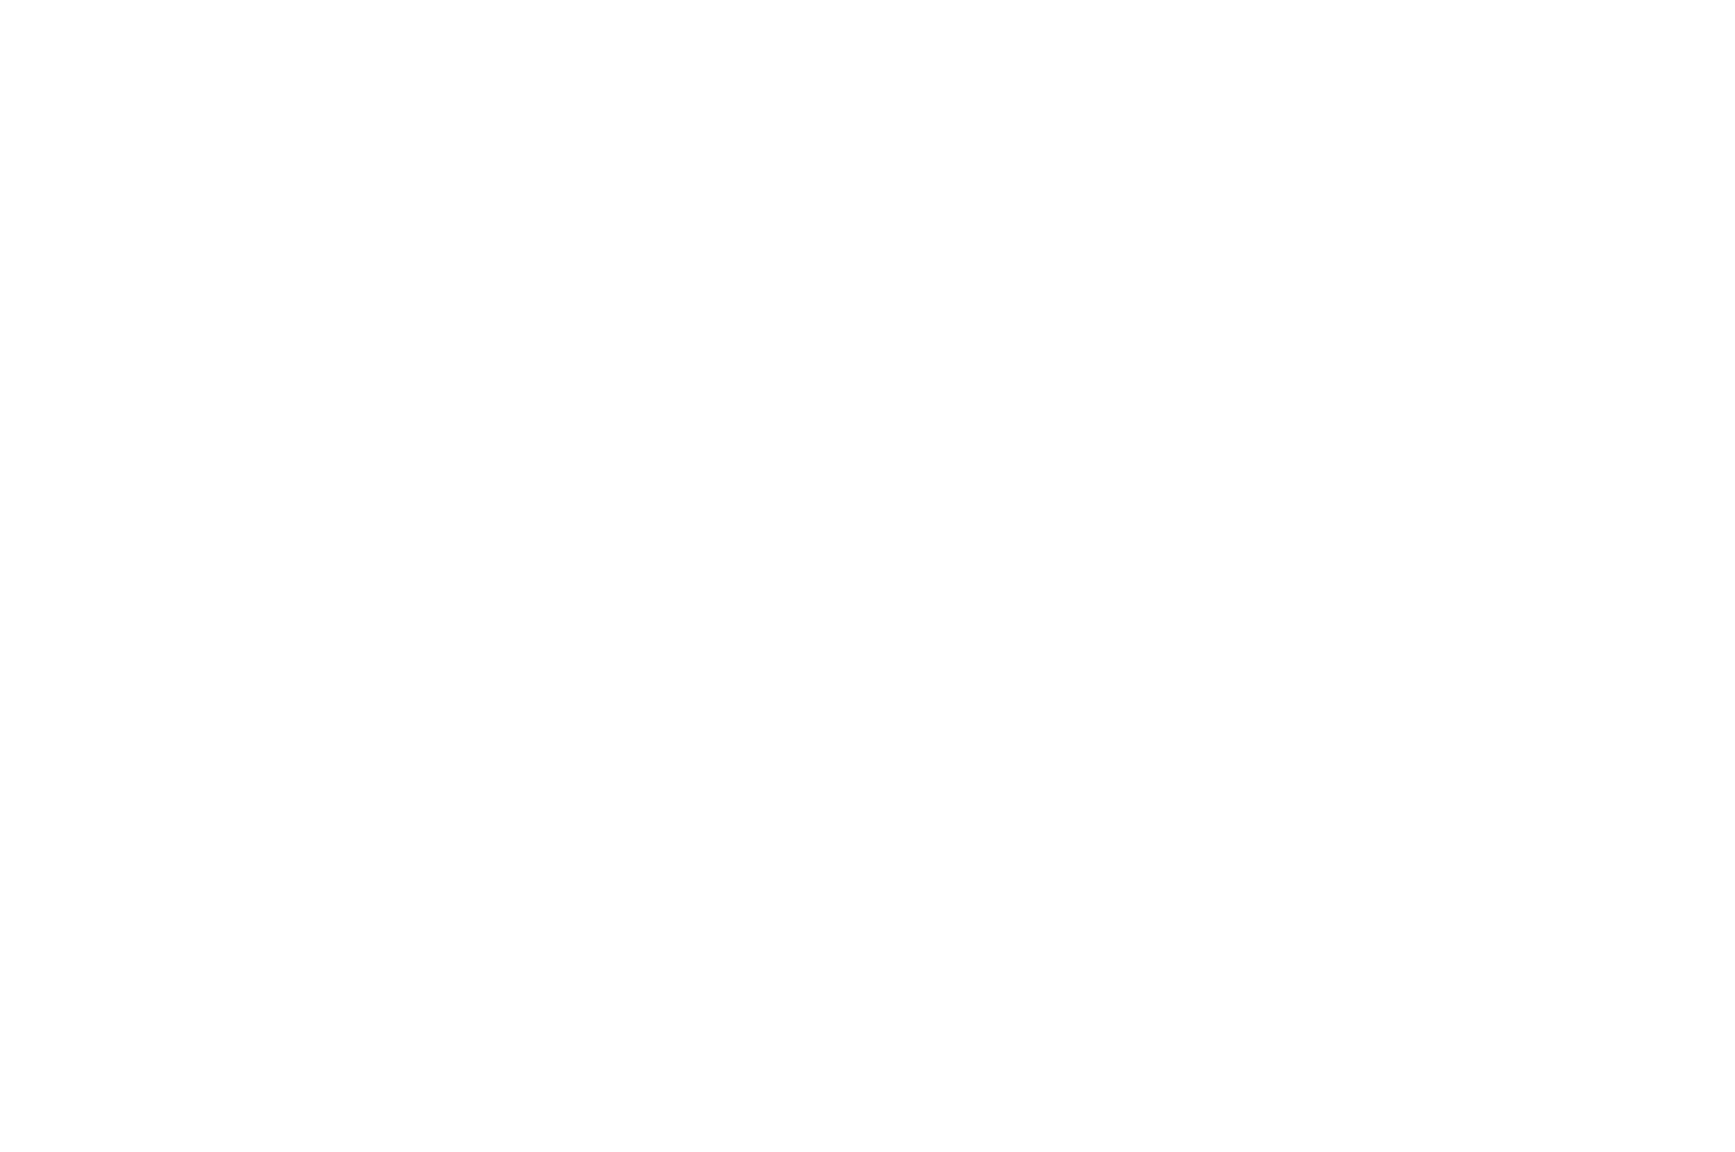 Best AmateurCollege Short Film - Elkhorn Valley Film and Media Conference - 2013.png